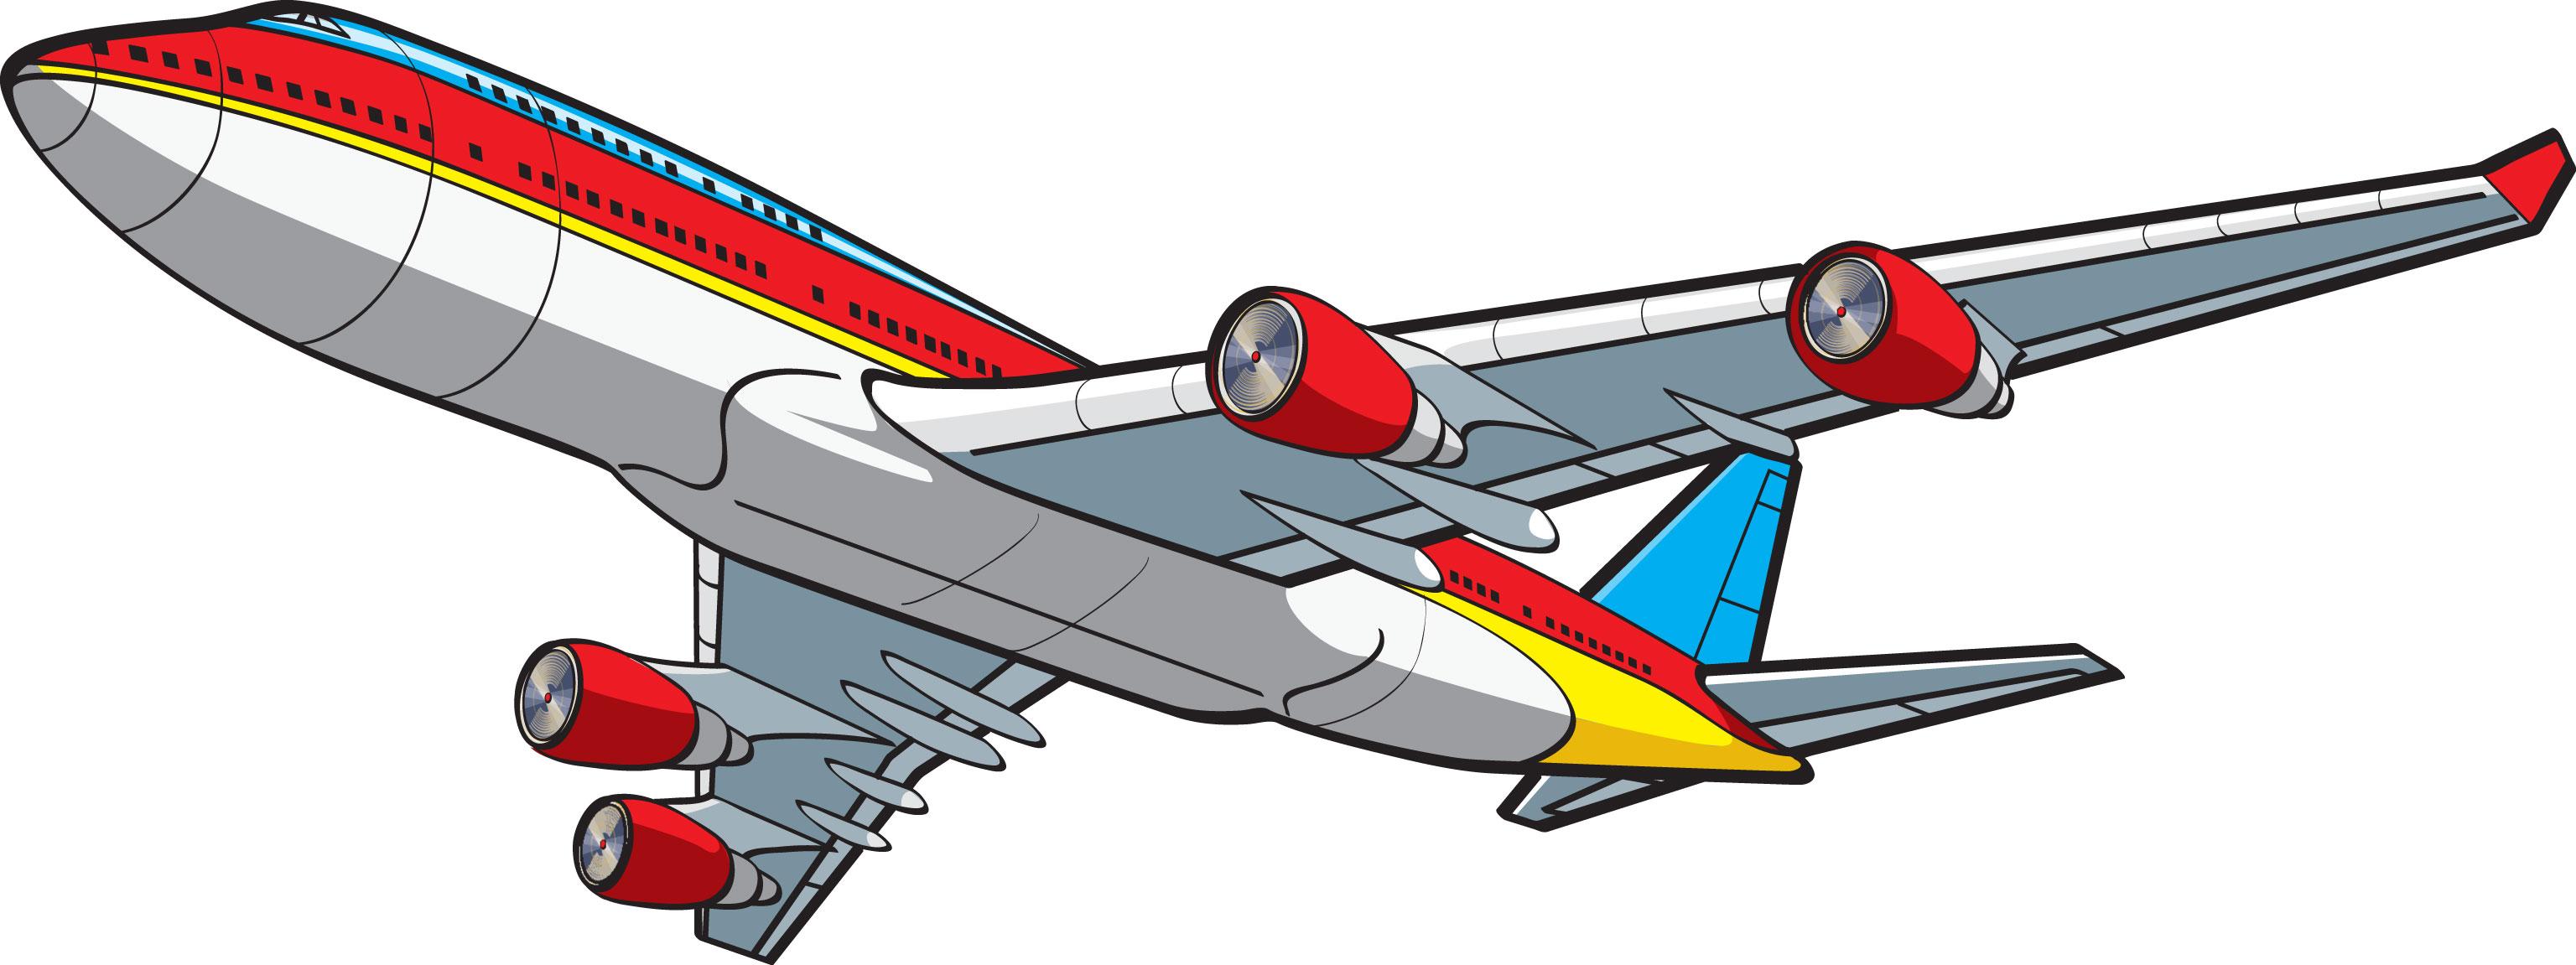 Aircraft Clip Art Photos | Clipart Panda - Free Clipart Images